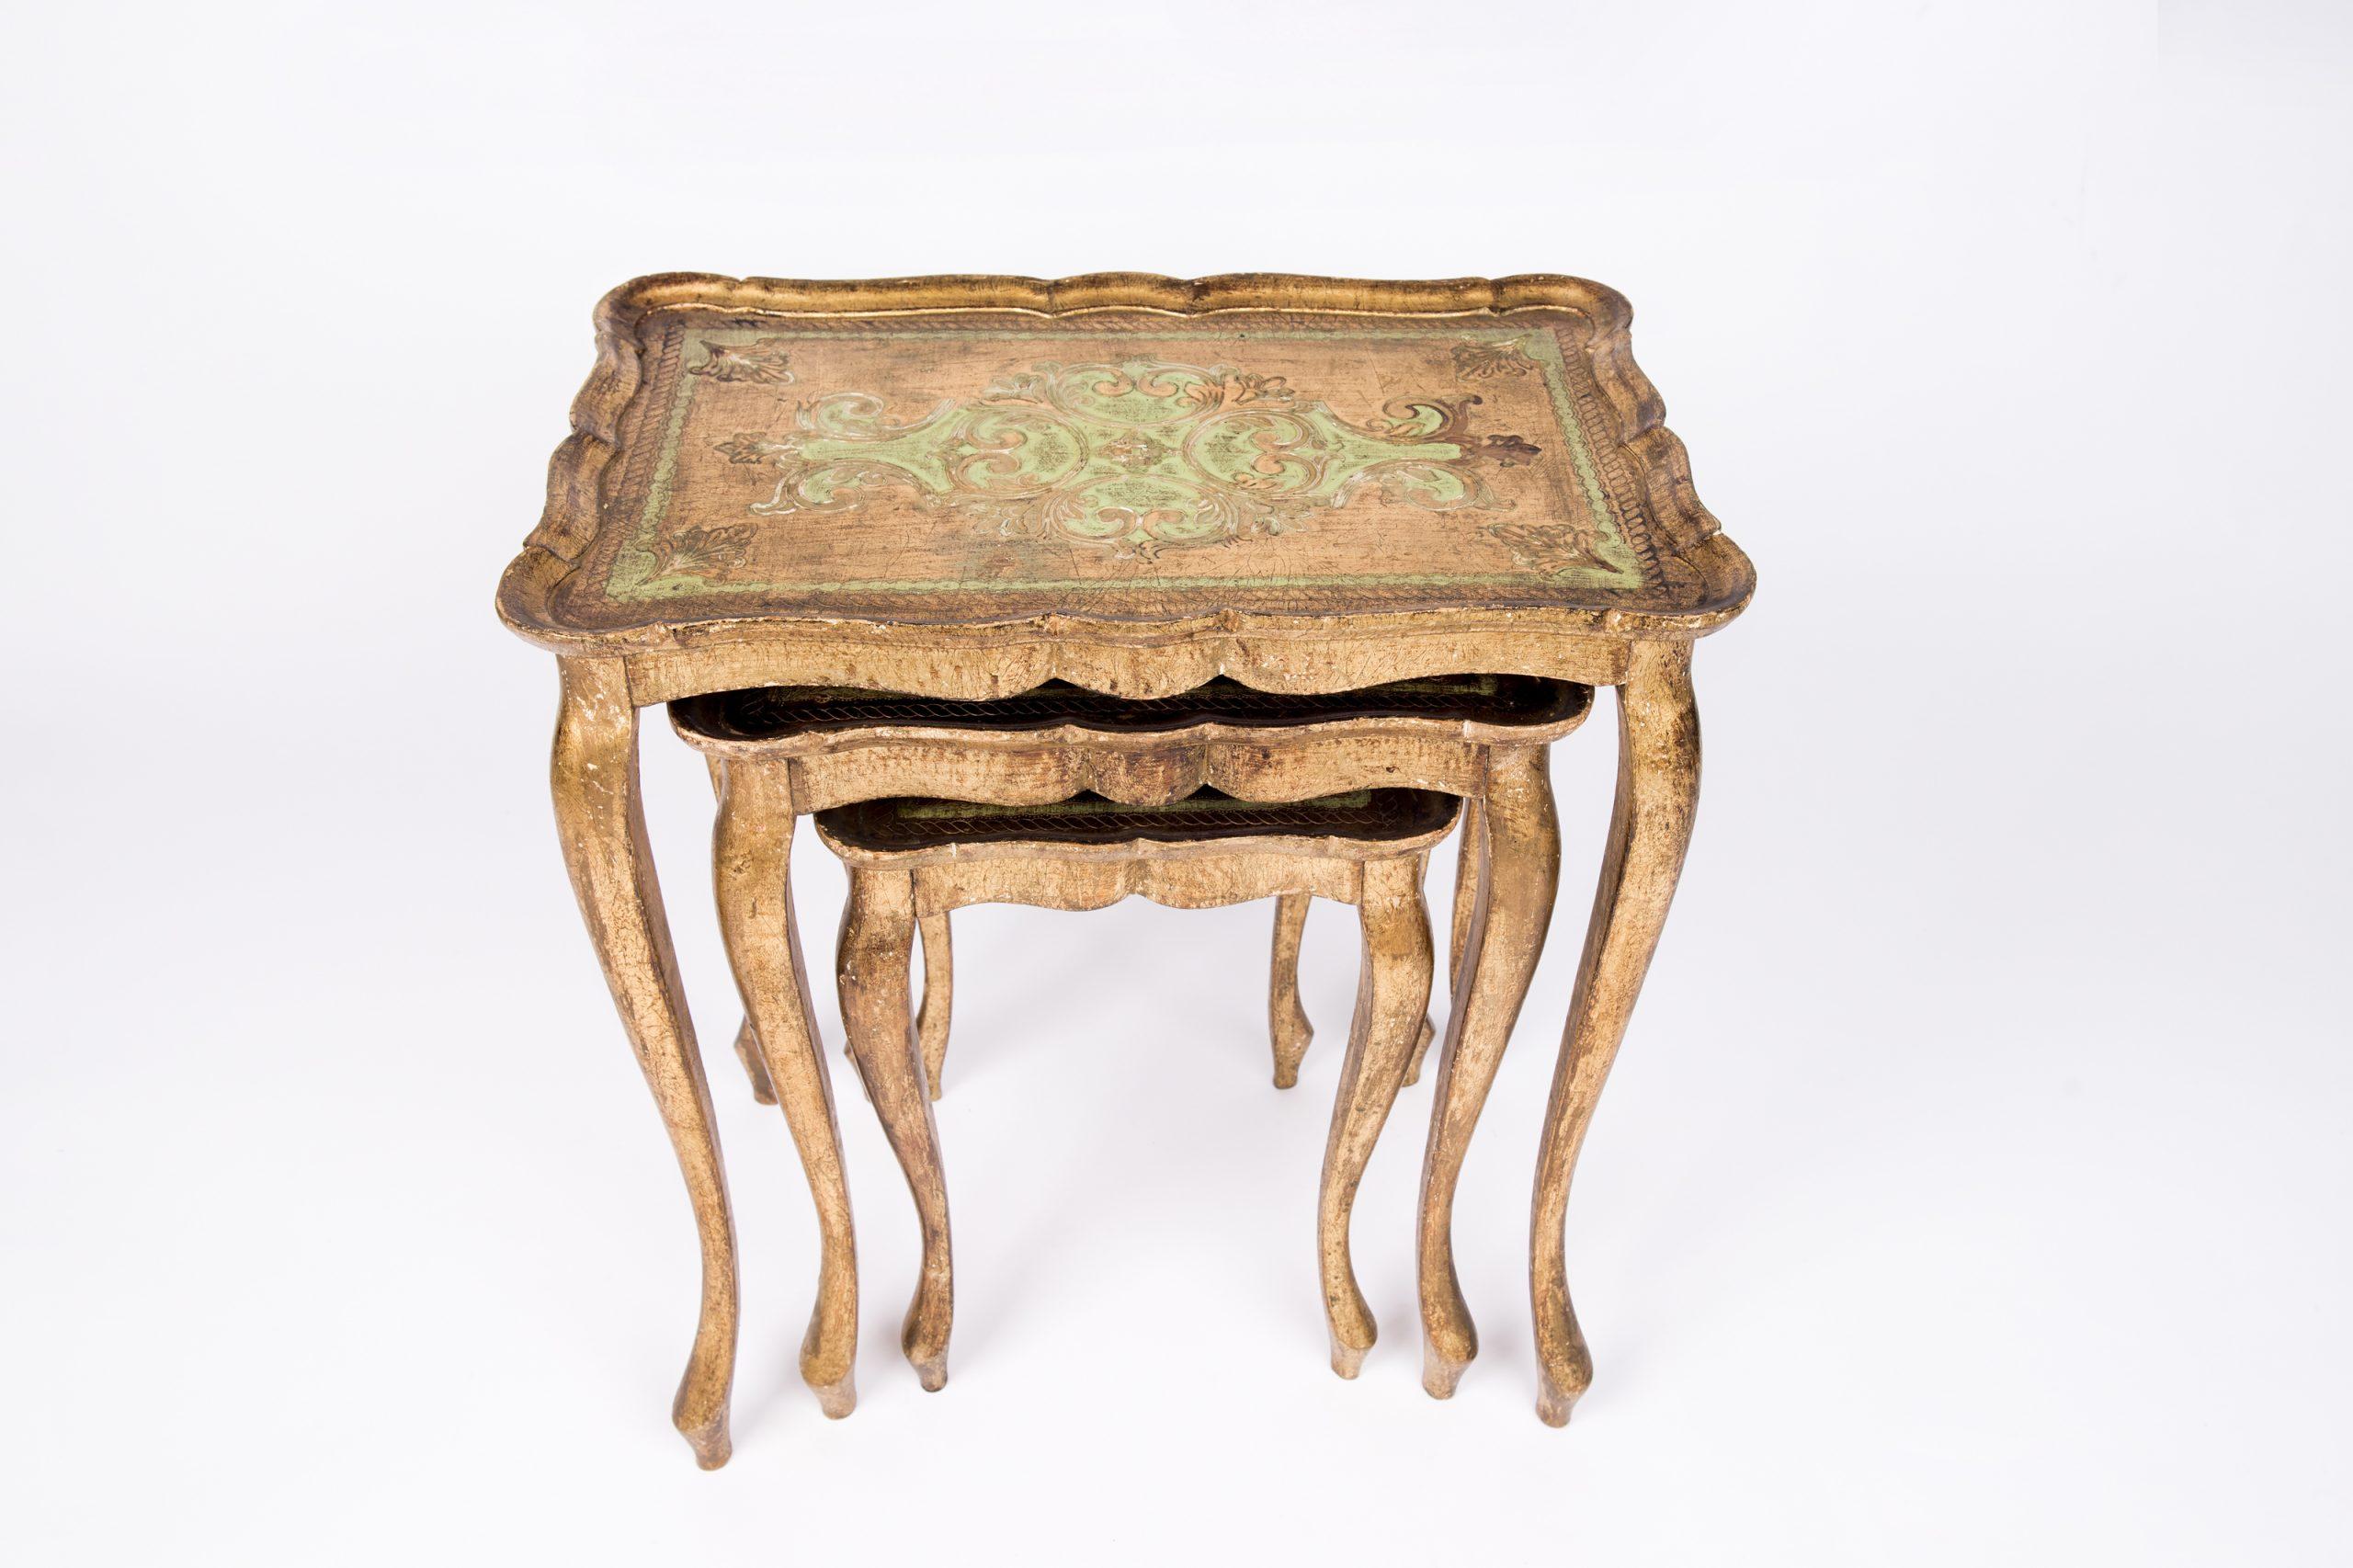 French origin gilded nesting tables